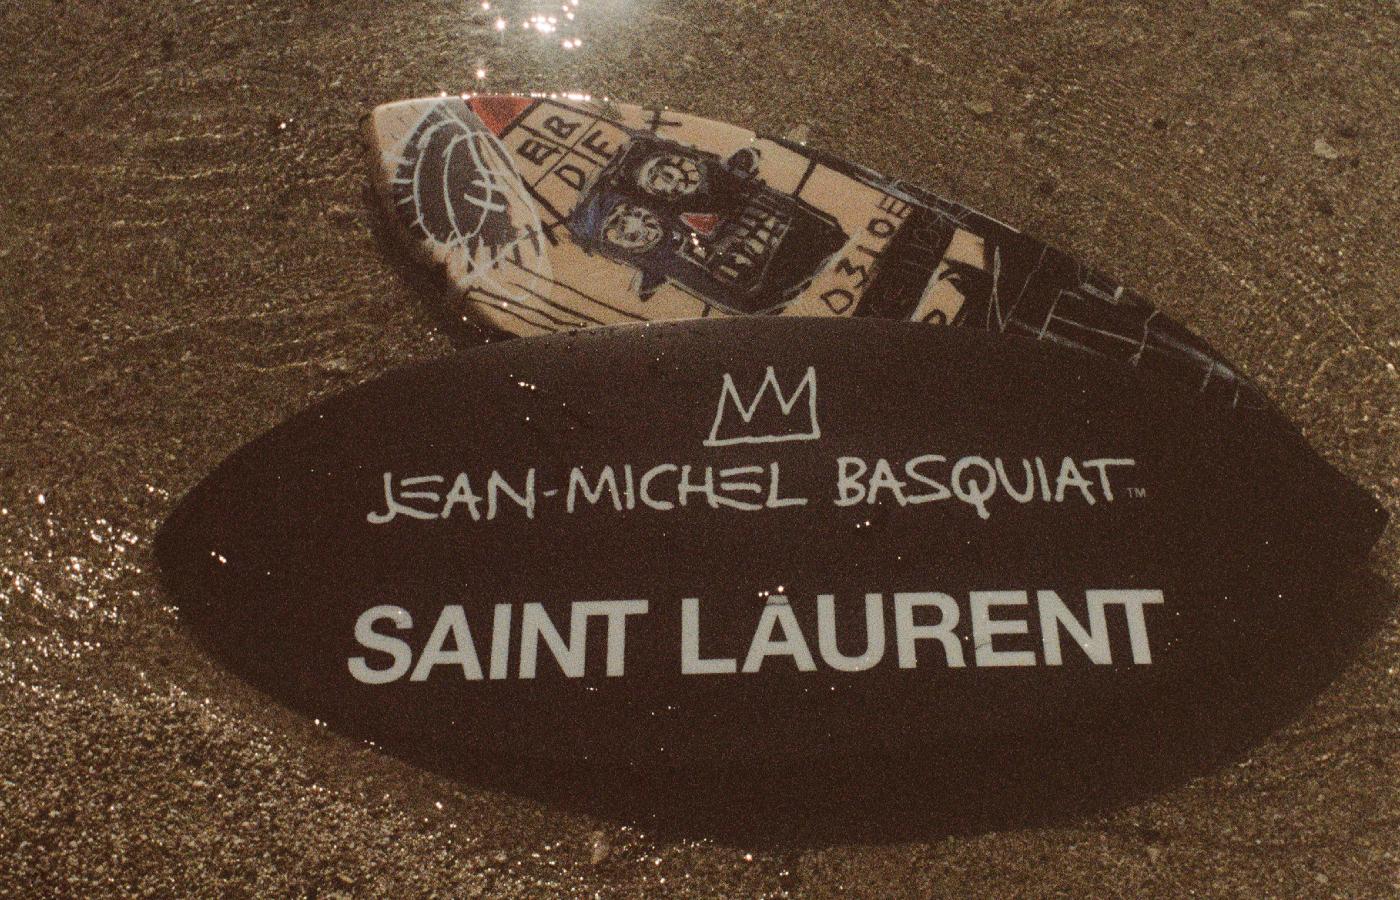 Saint Laurent Basquiat Capsule Collection